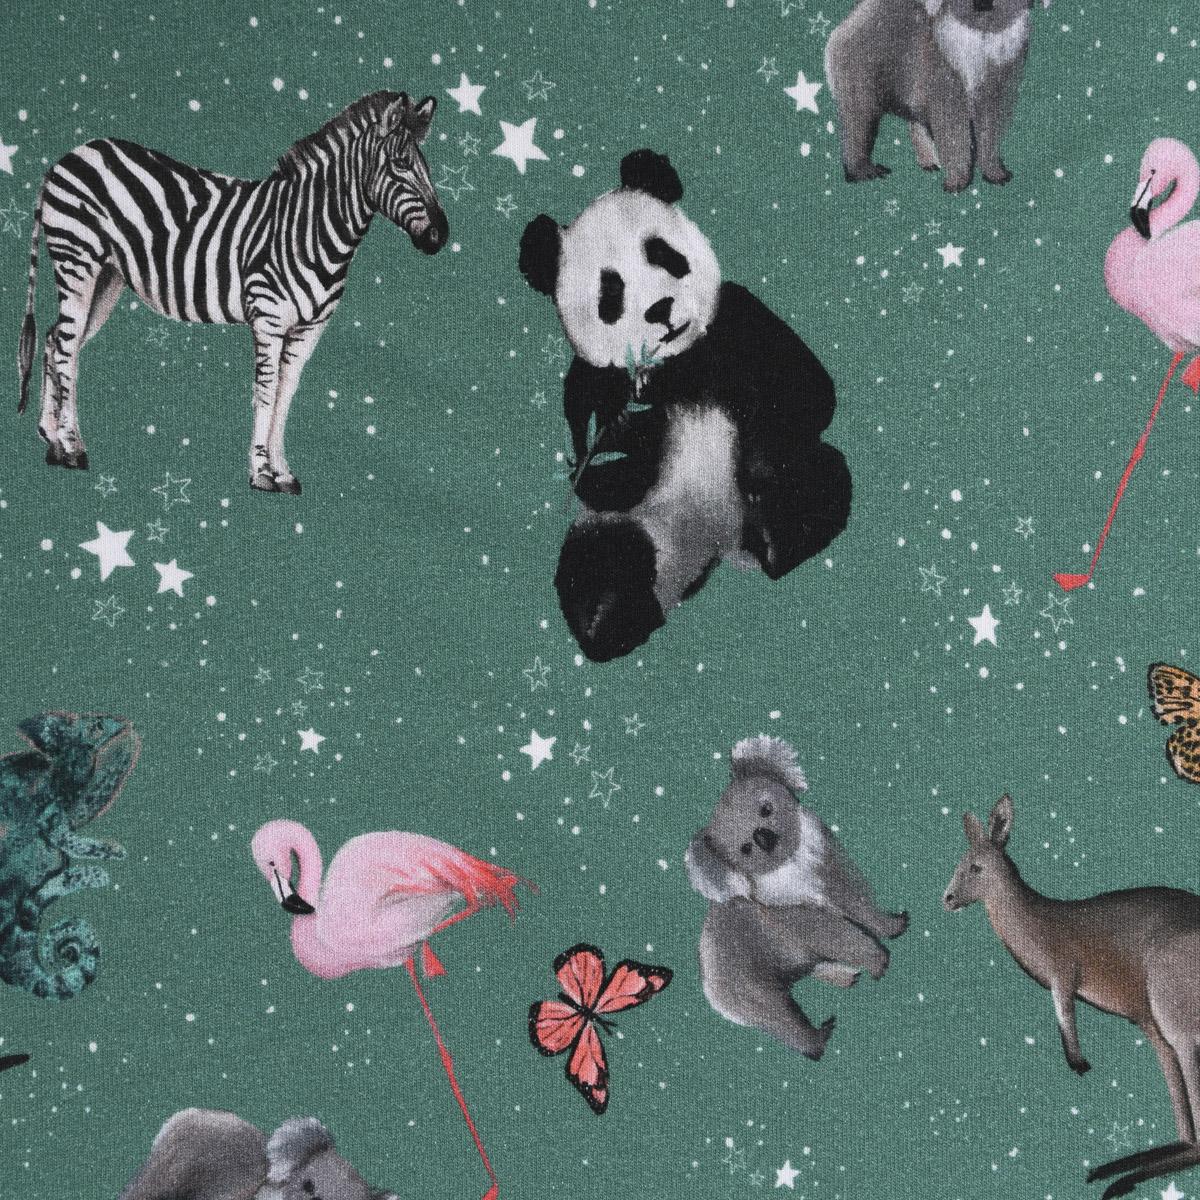 Sweatstoff Bio GOTS Digitaldruck Tiere Panda Koala Sterne grün bunt 1,45m Breite